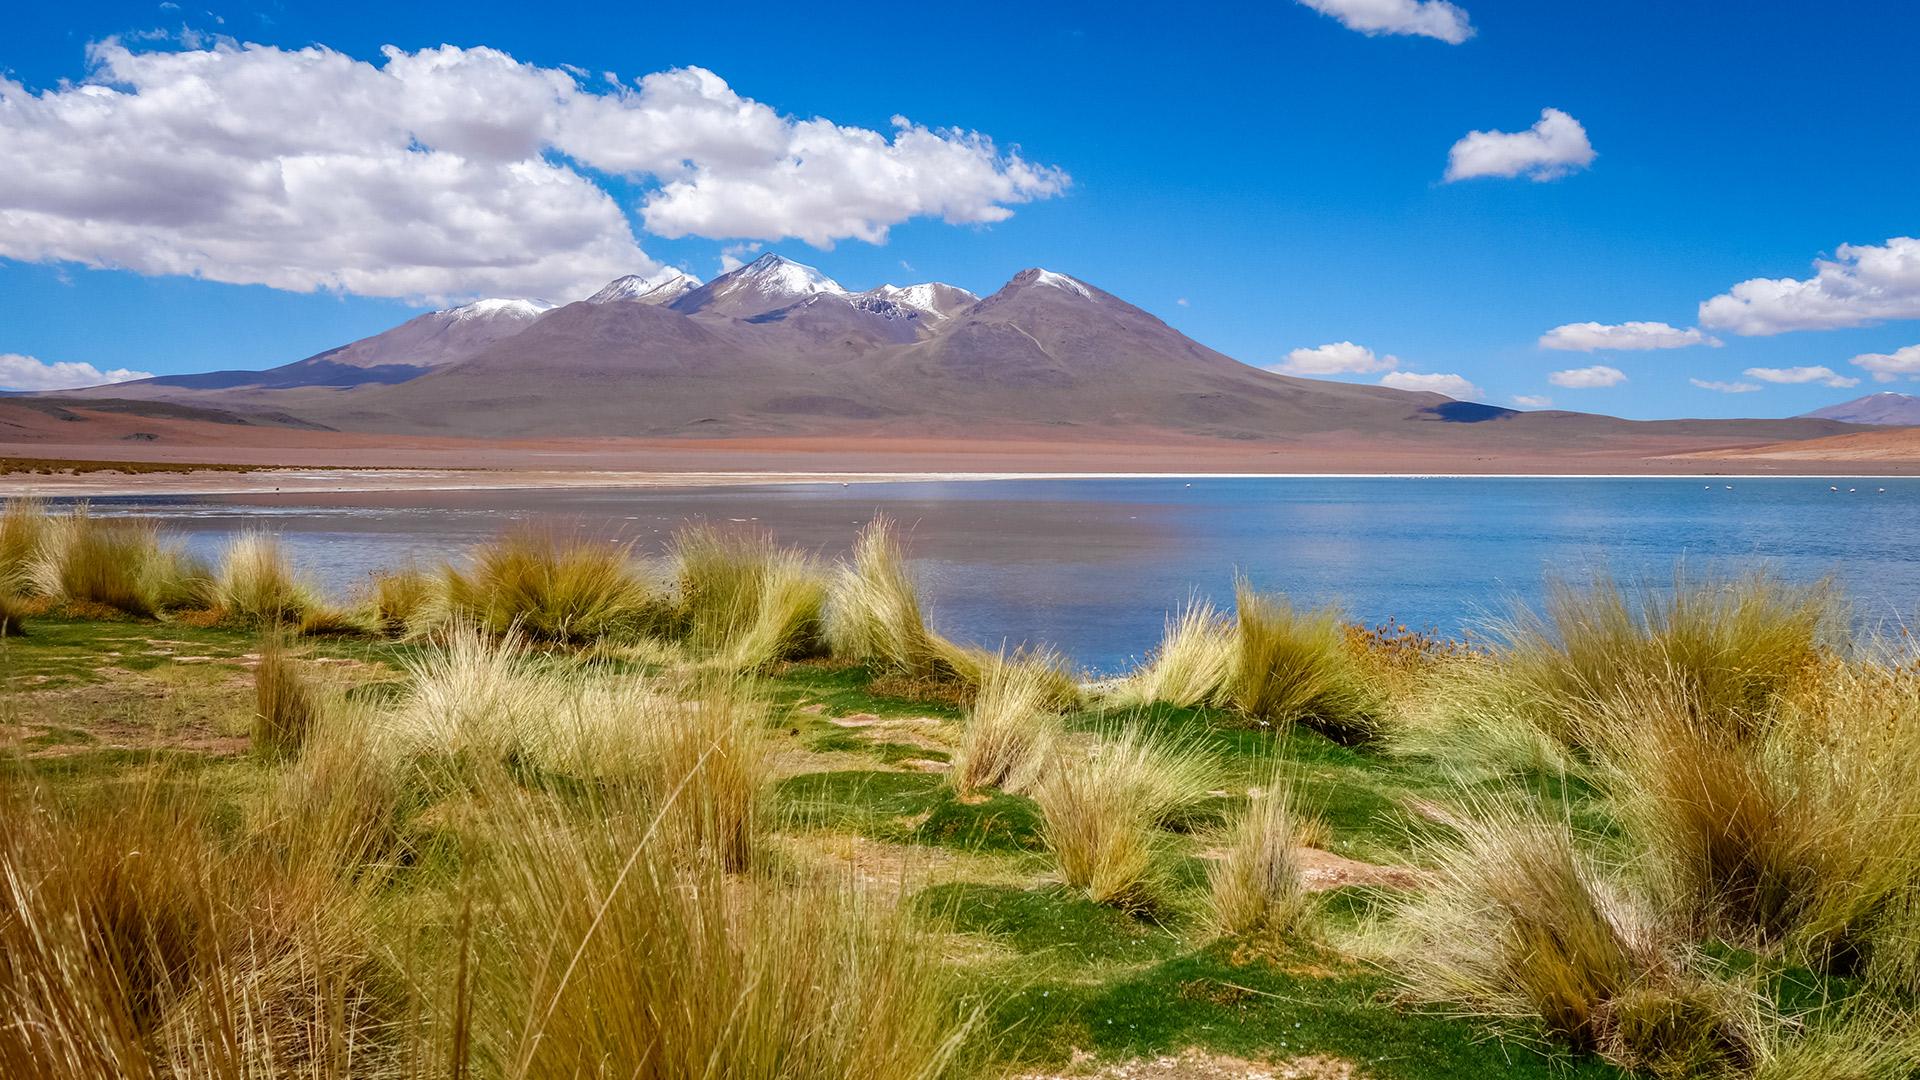 Turismo en Bolivia hero asset